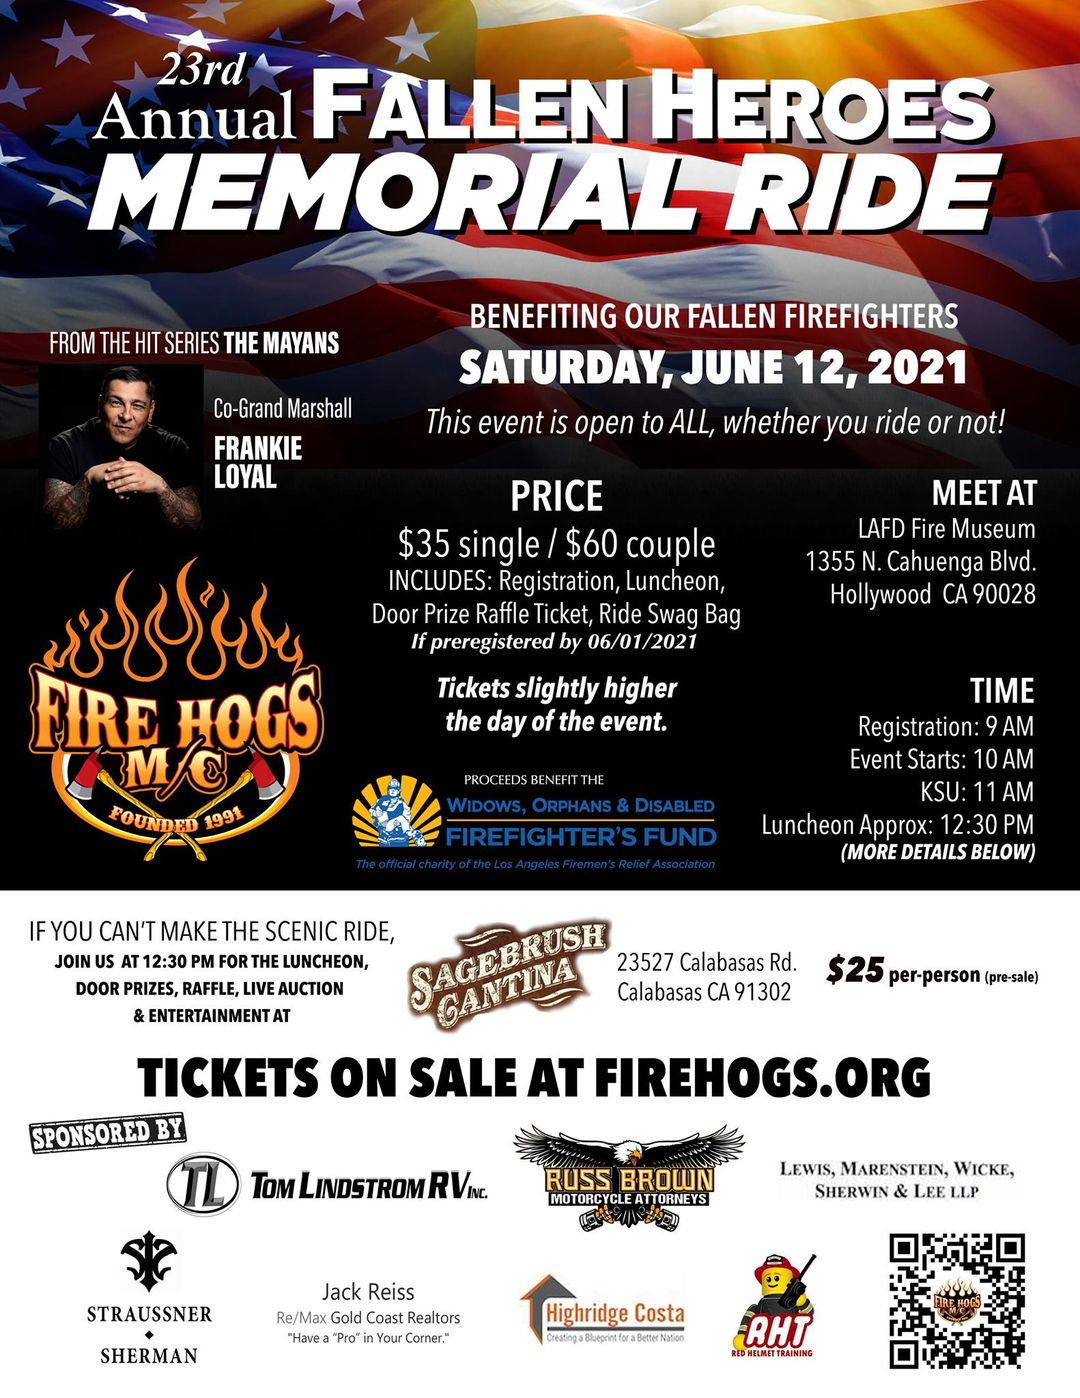 Fire Hogs Memorial